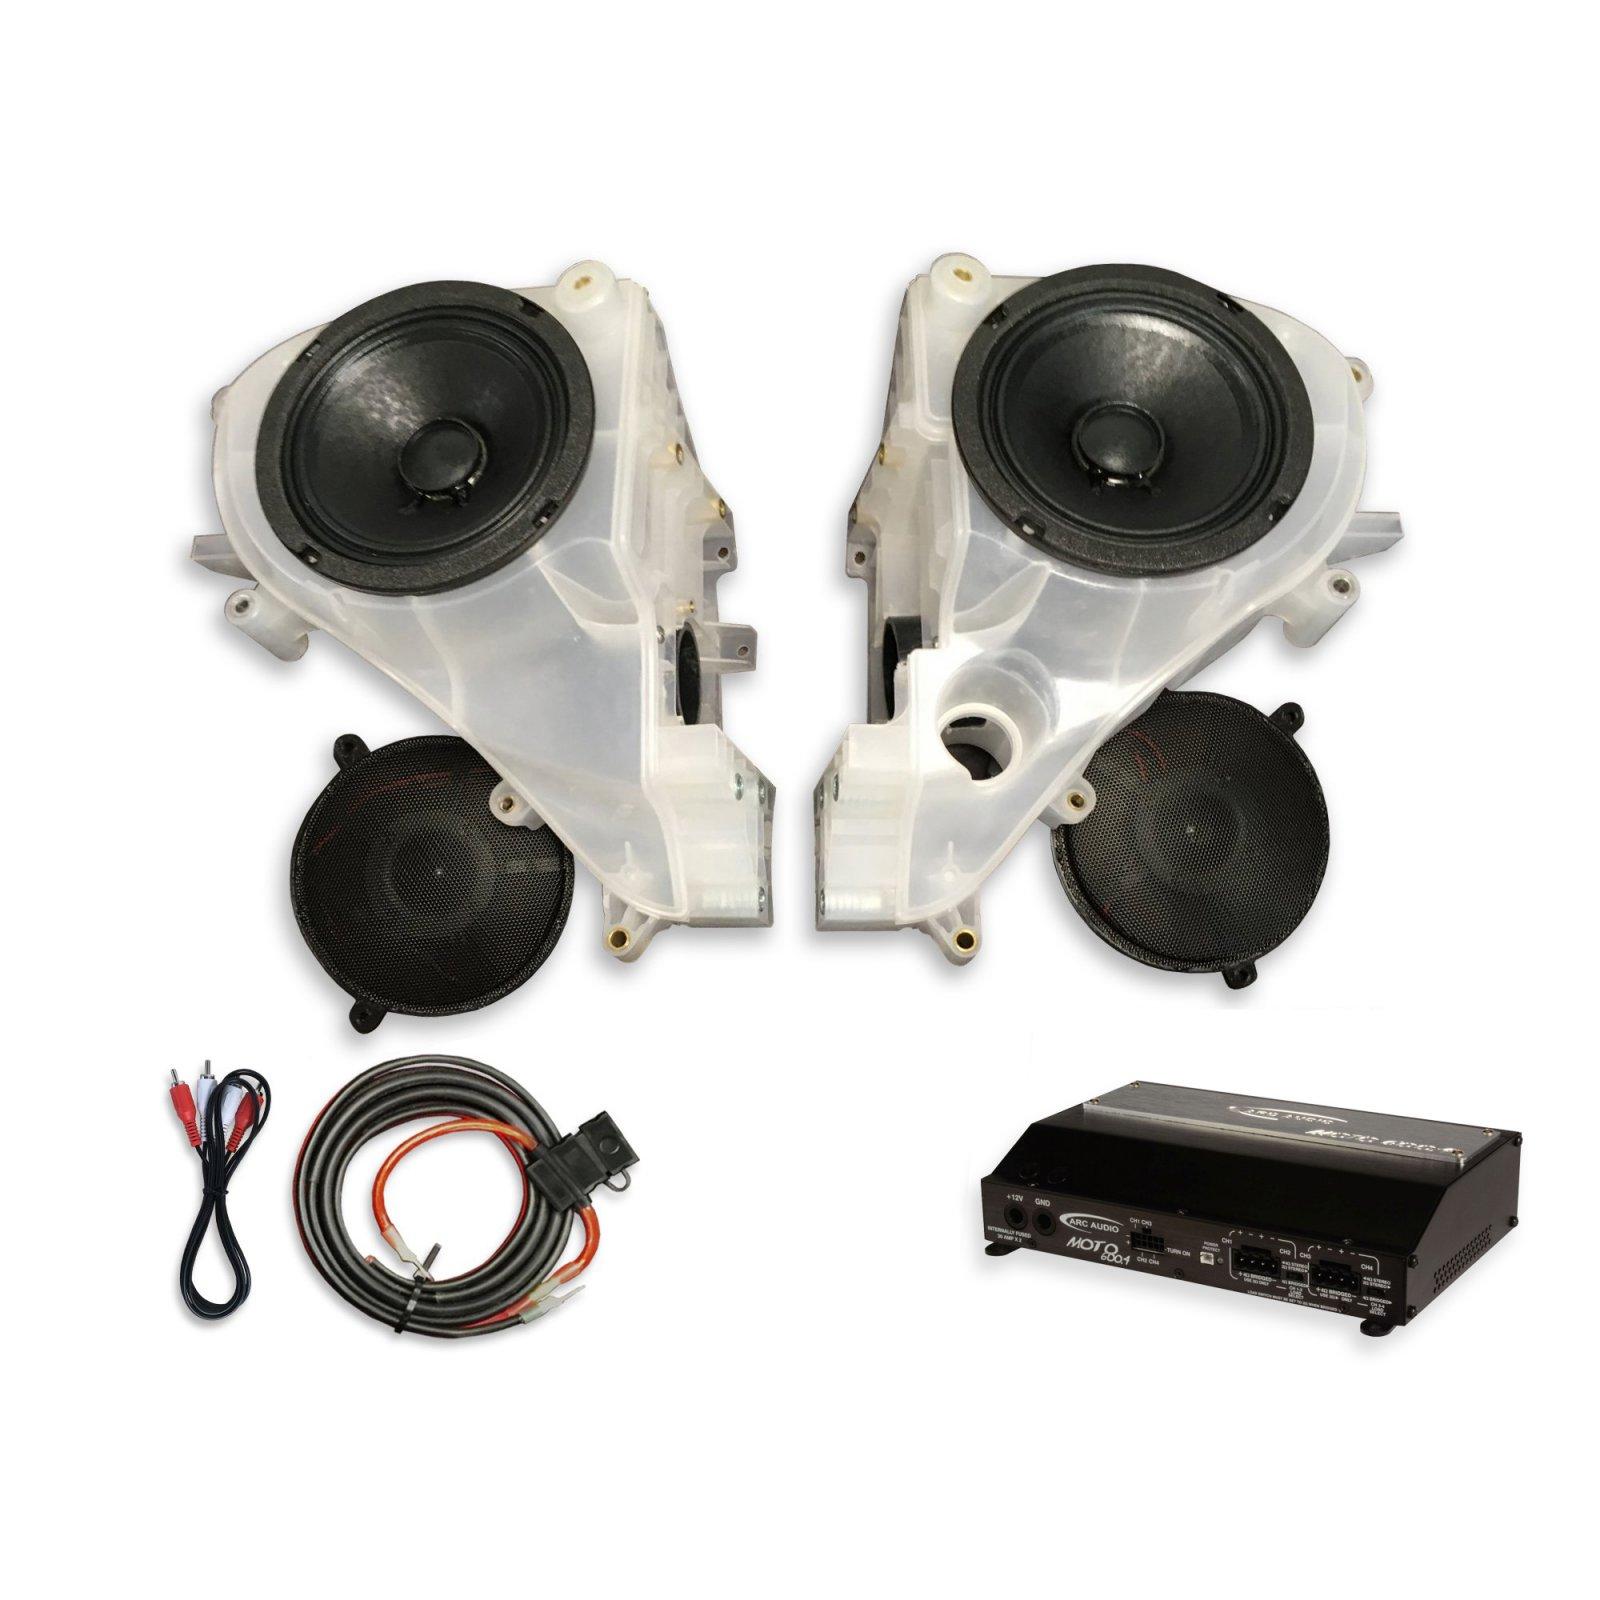 14-18 Street Glide SinisterSound Fairing System w/Arc Audio Moto720 - NO LINE LEVEL